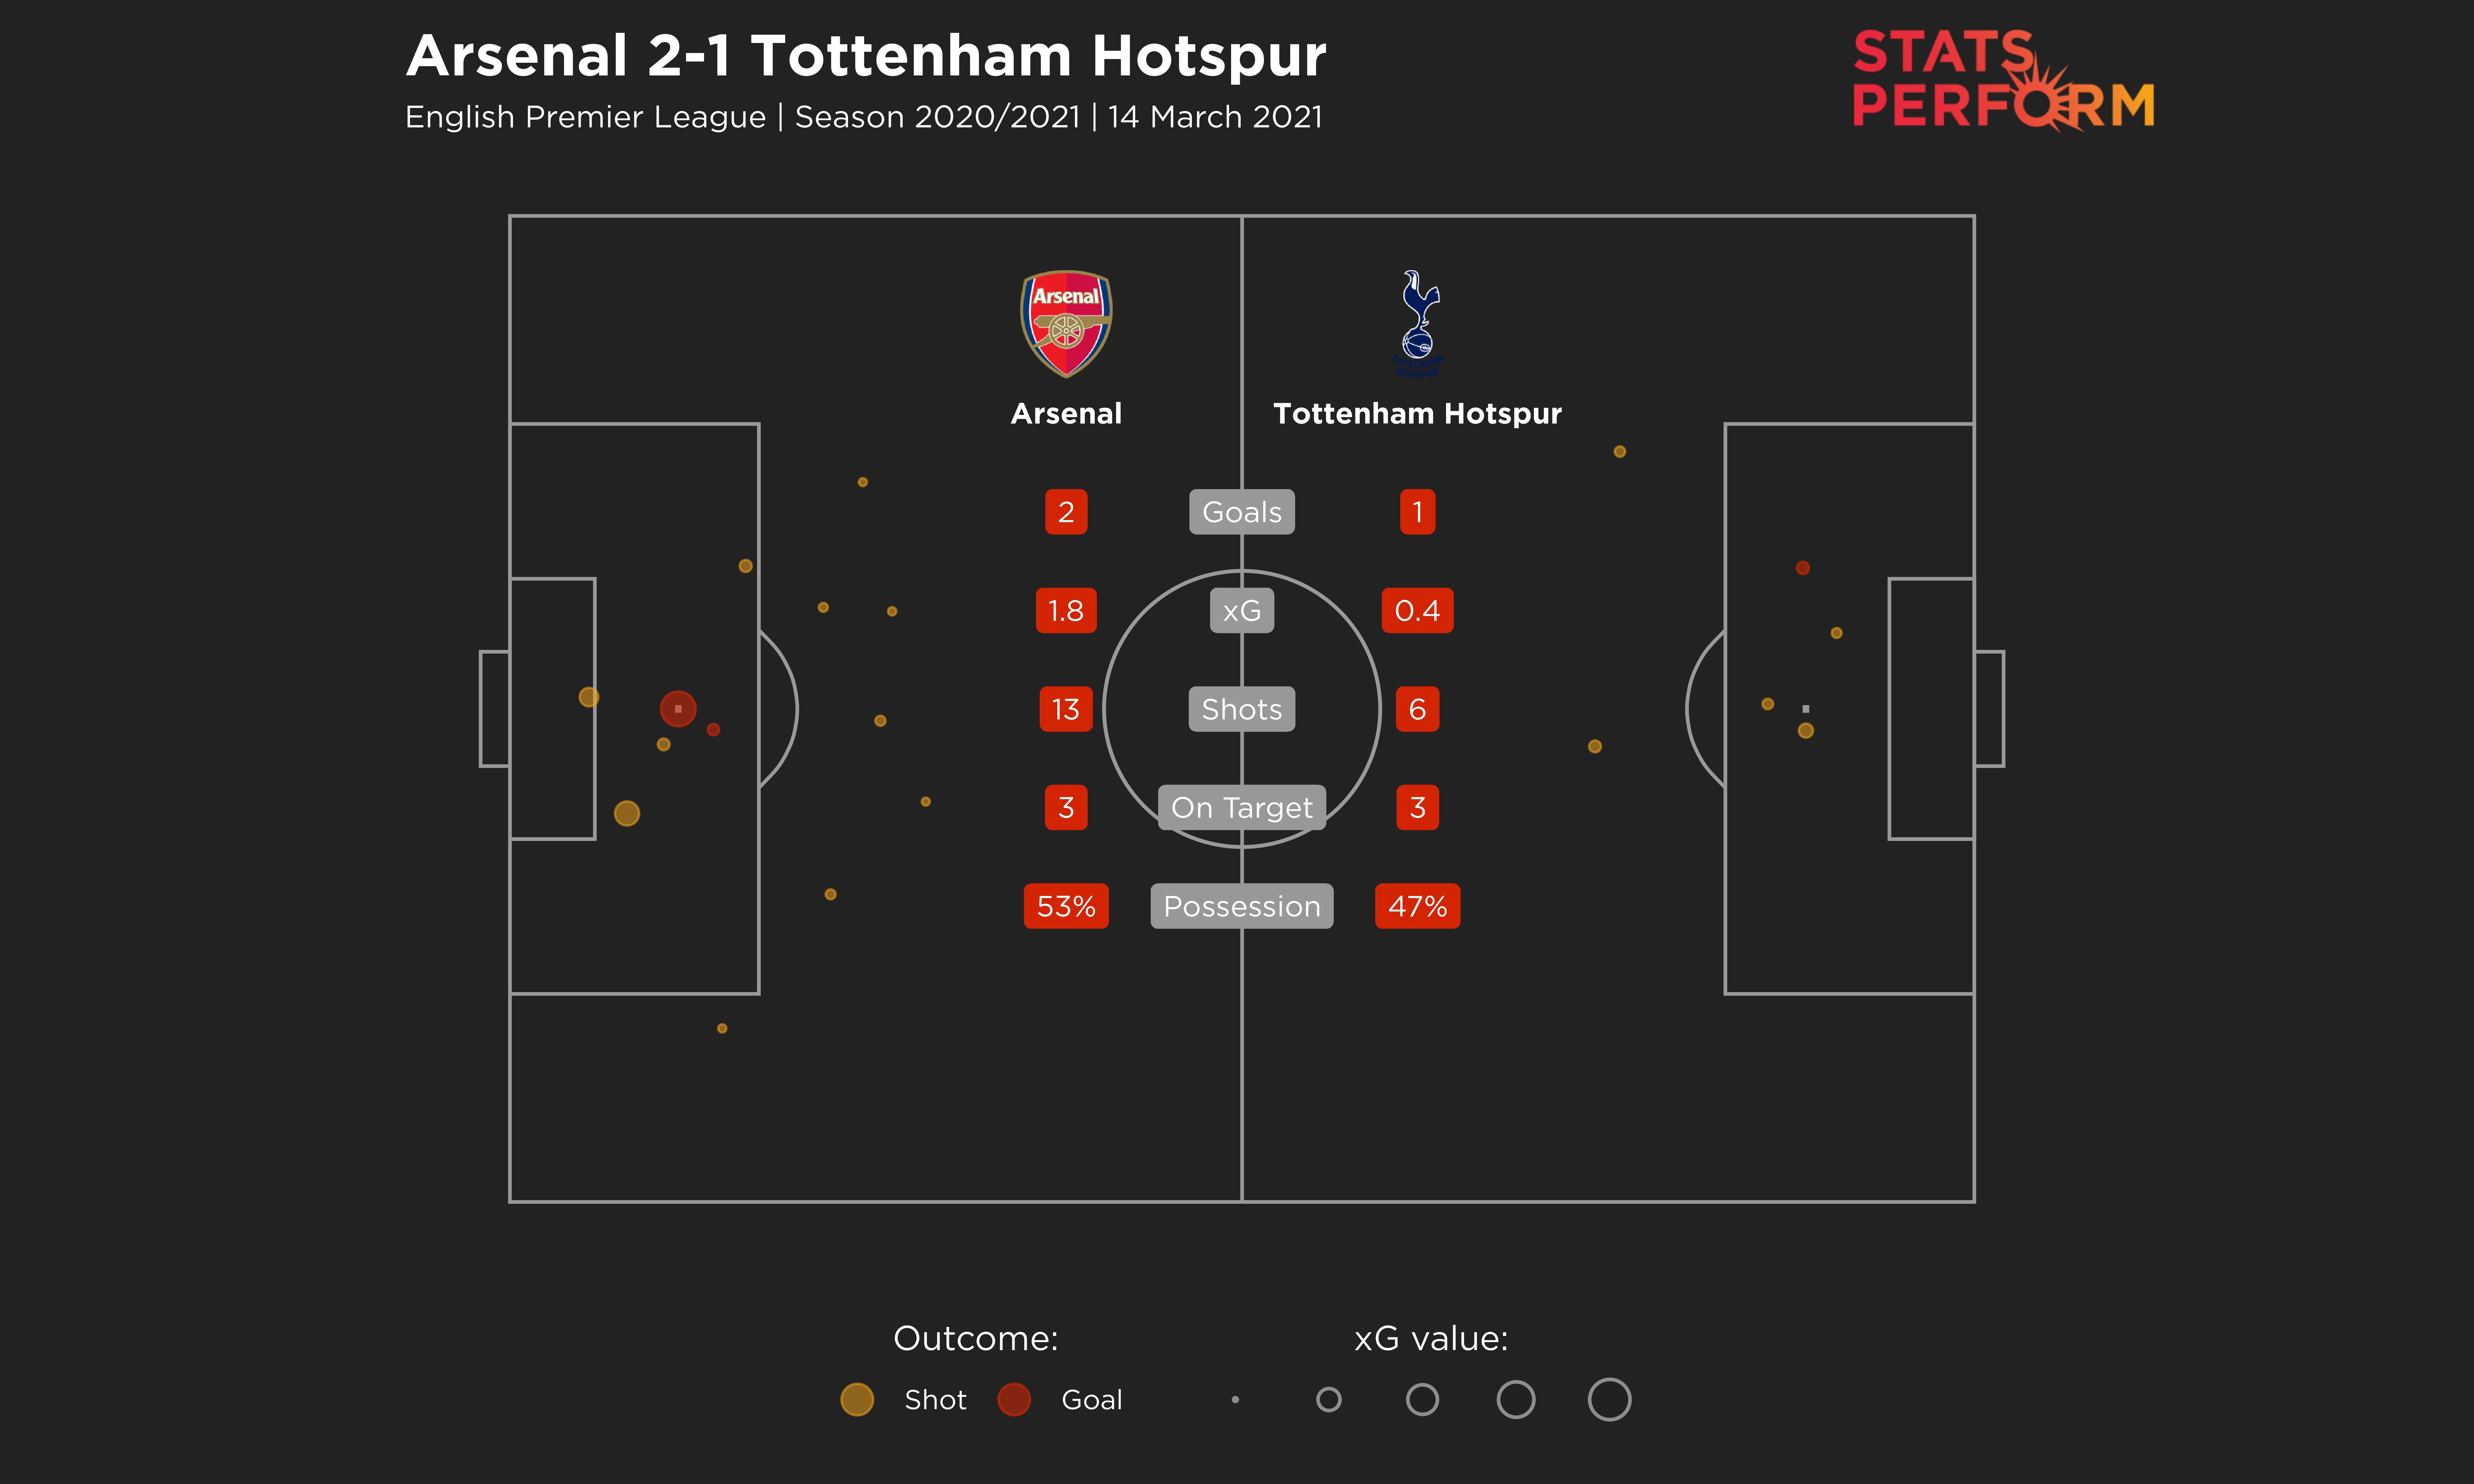 Arsenal 2-1 Tottenham expected goals